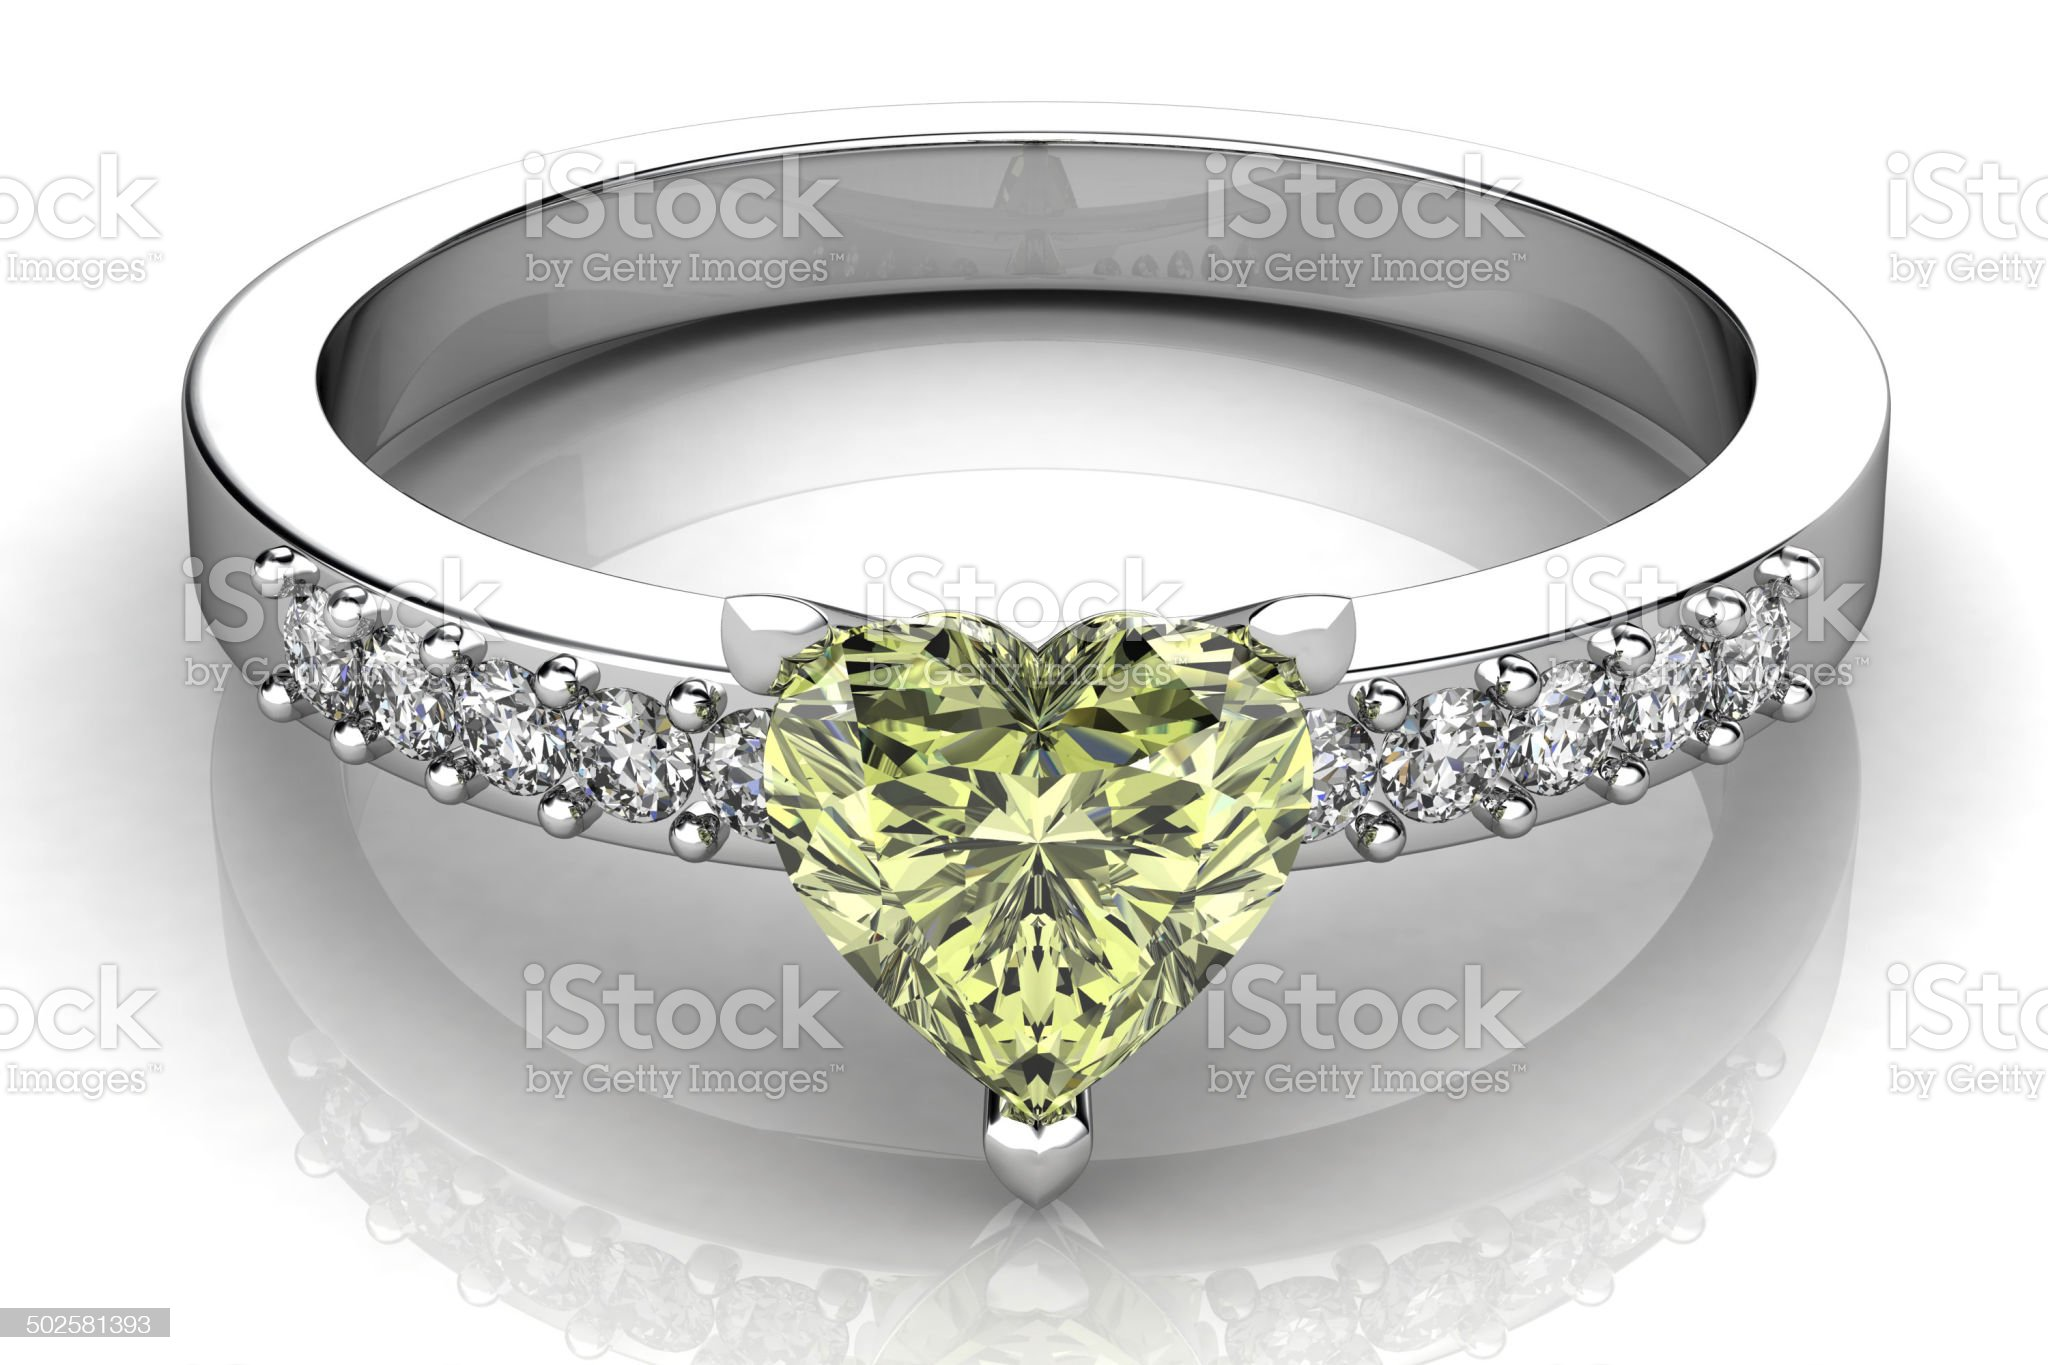 the beauty wedding ring royalty-free stock photo